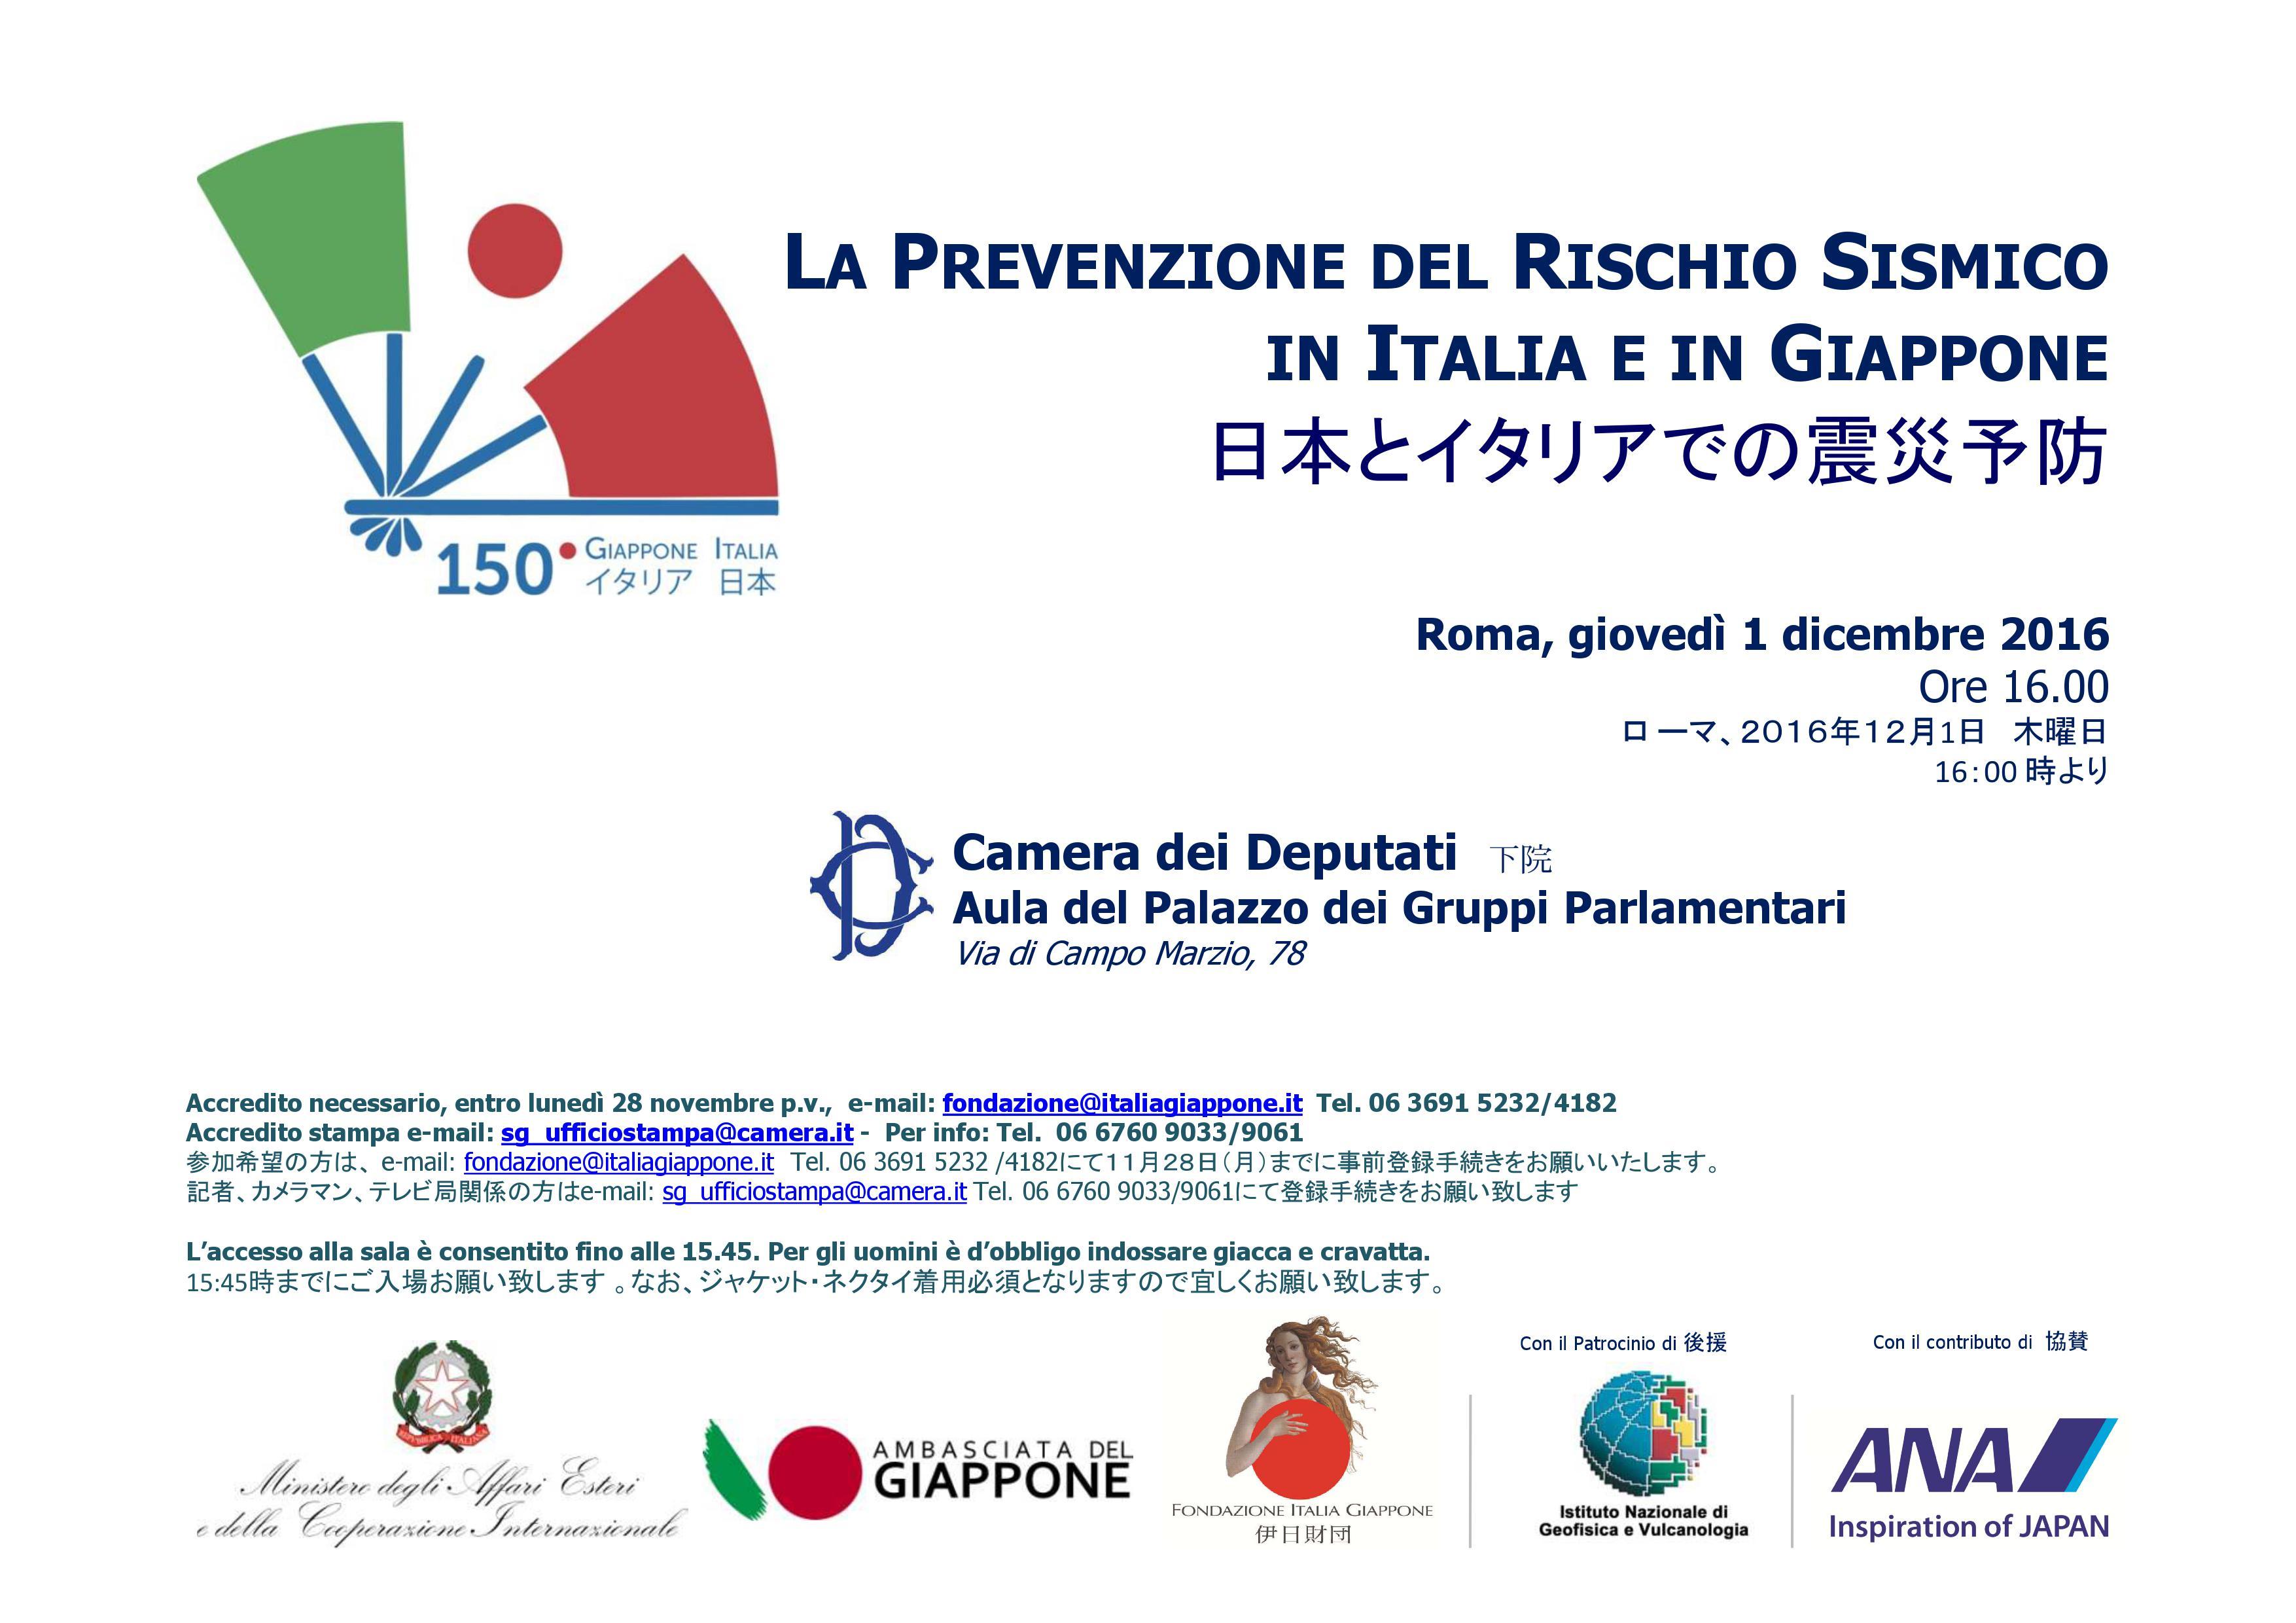 Ambasciata del giappone in italia for Presenze camera deputati